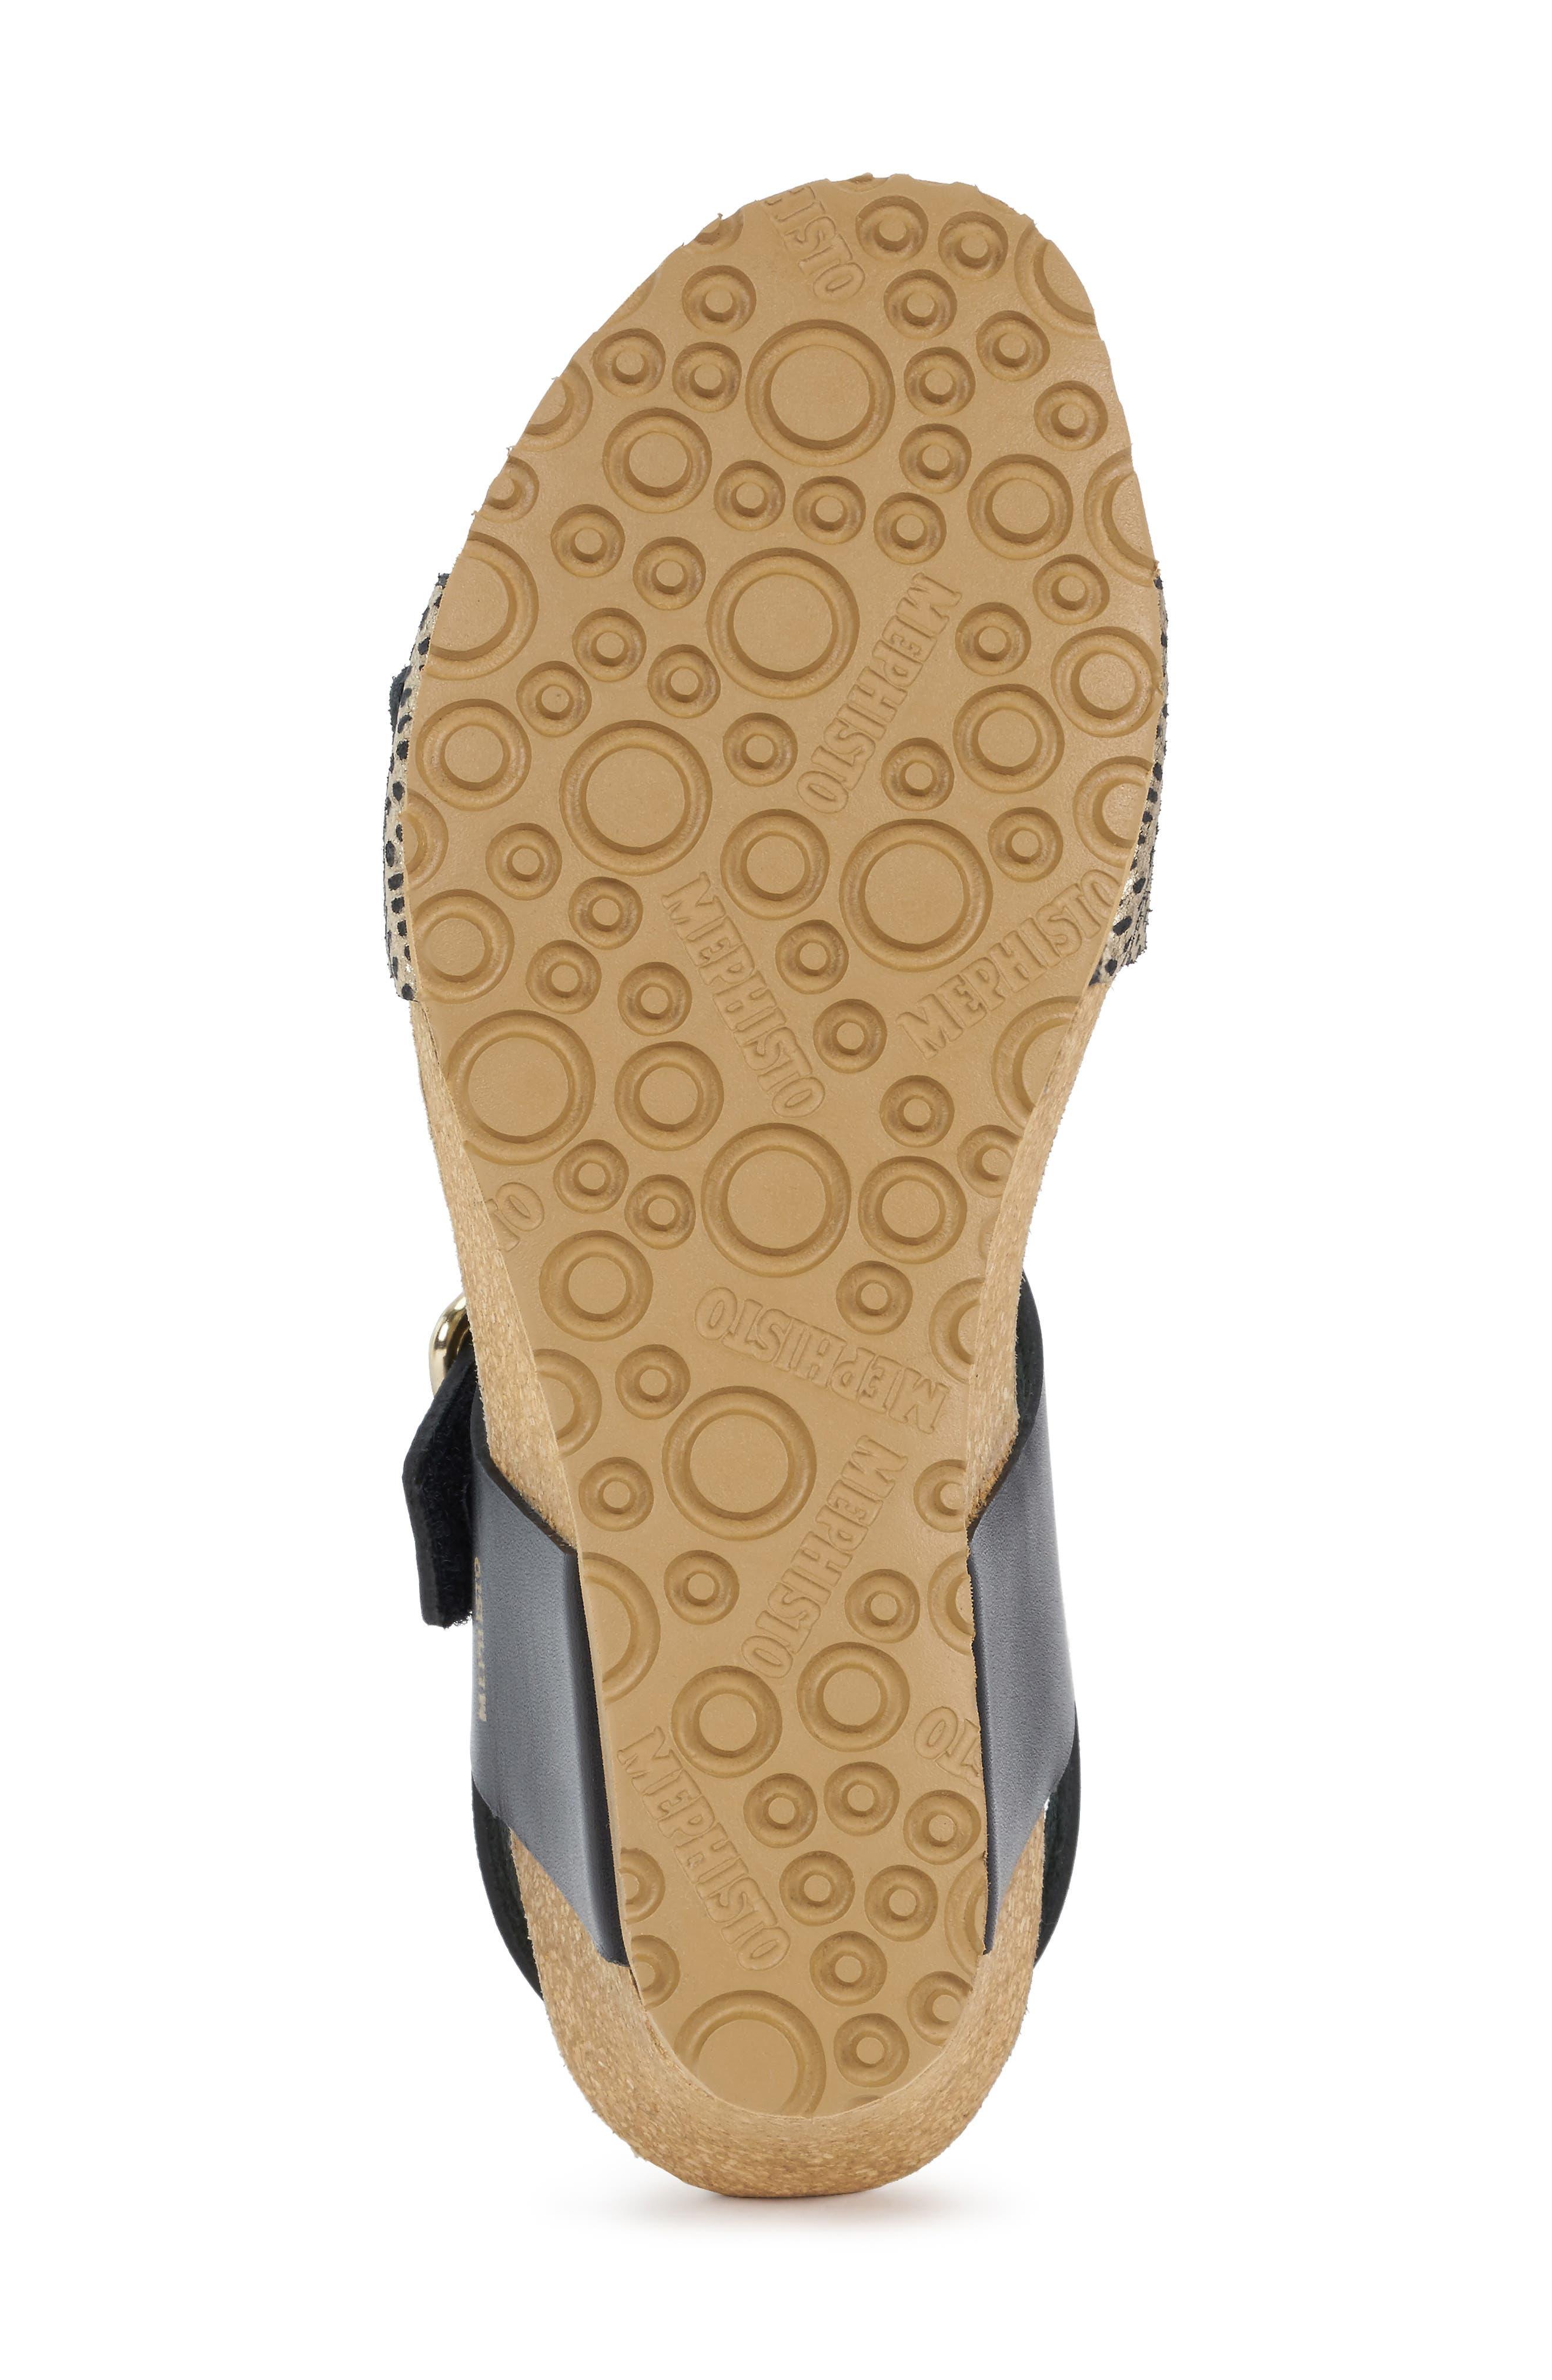 MEPHISTO, Lissandra Platform Wedge Sandal, Alternate thumbnail 6, color, BLACK/ GOLD LEATHER